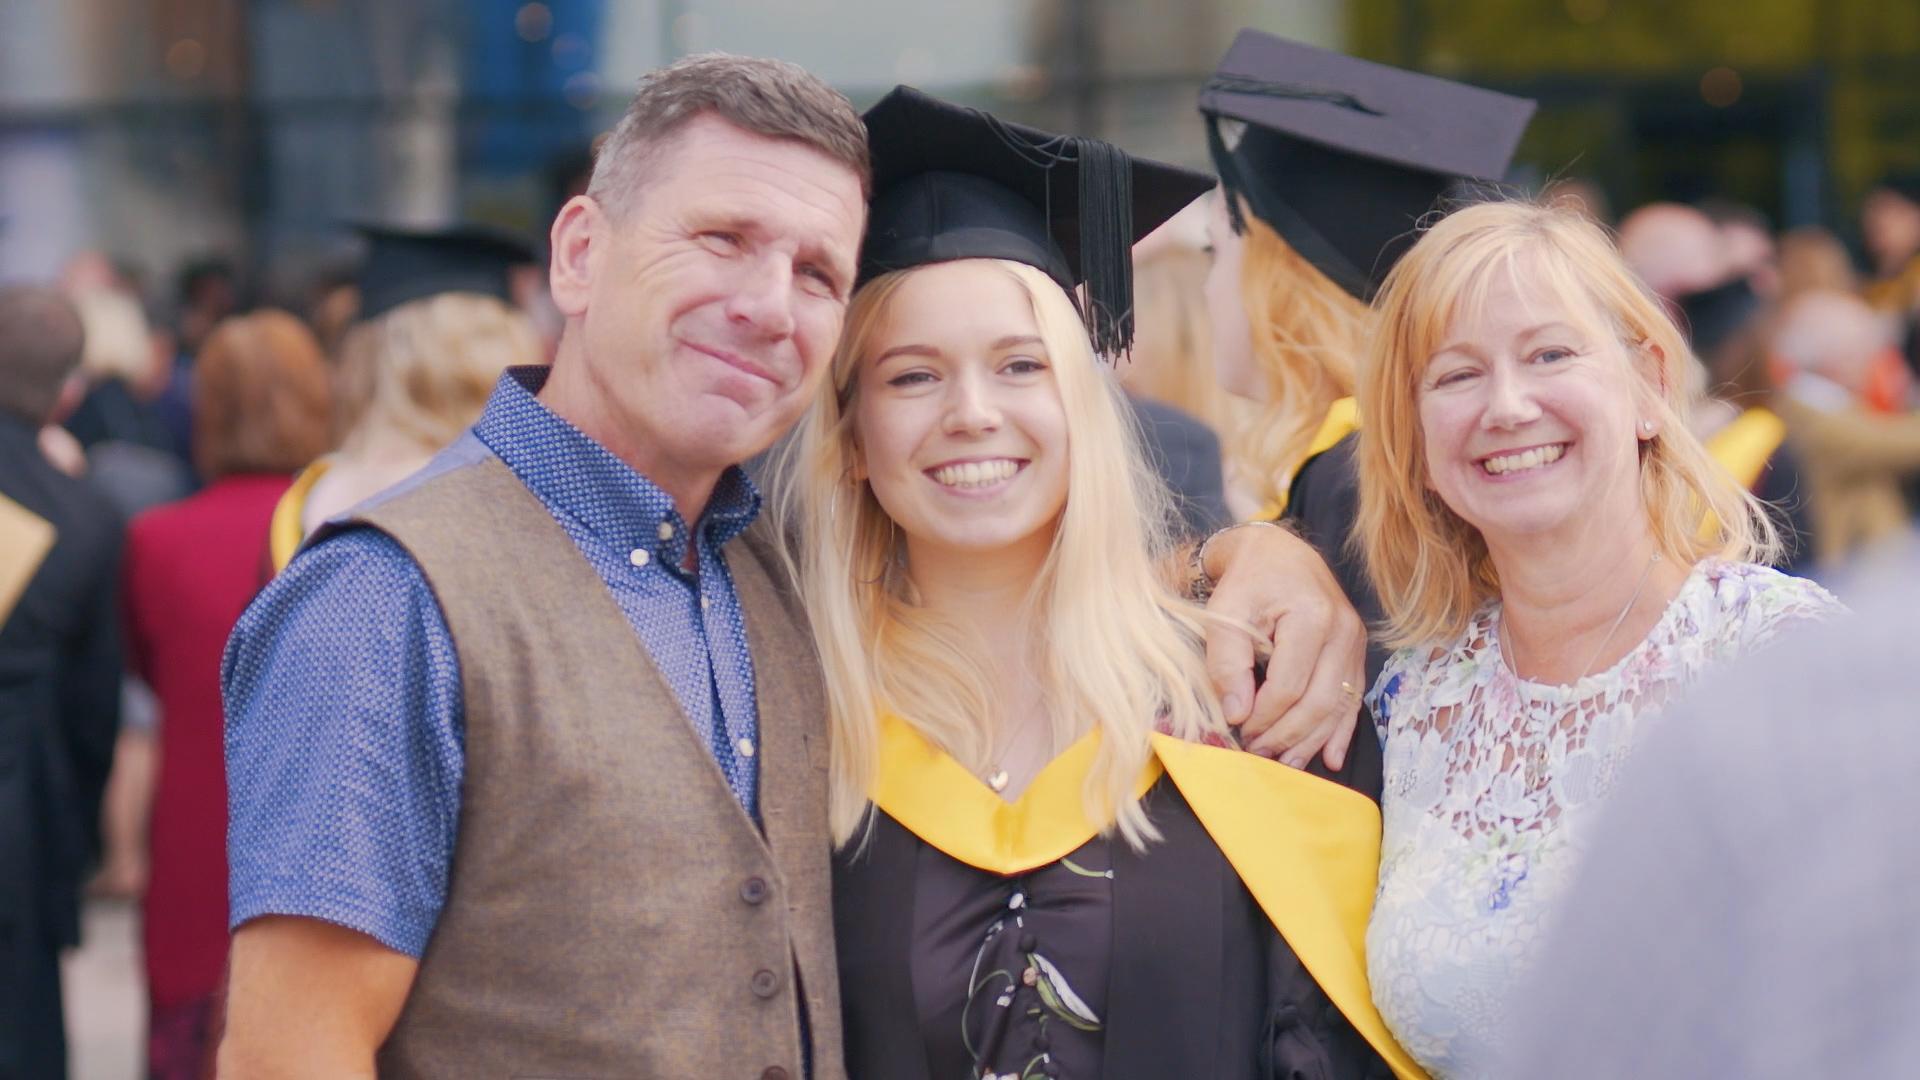 Cardiff Met - Graduation Photo